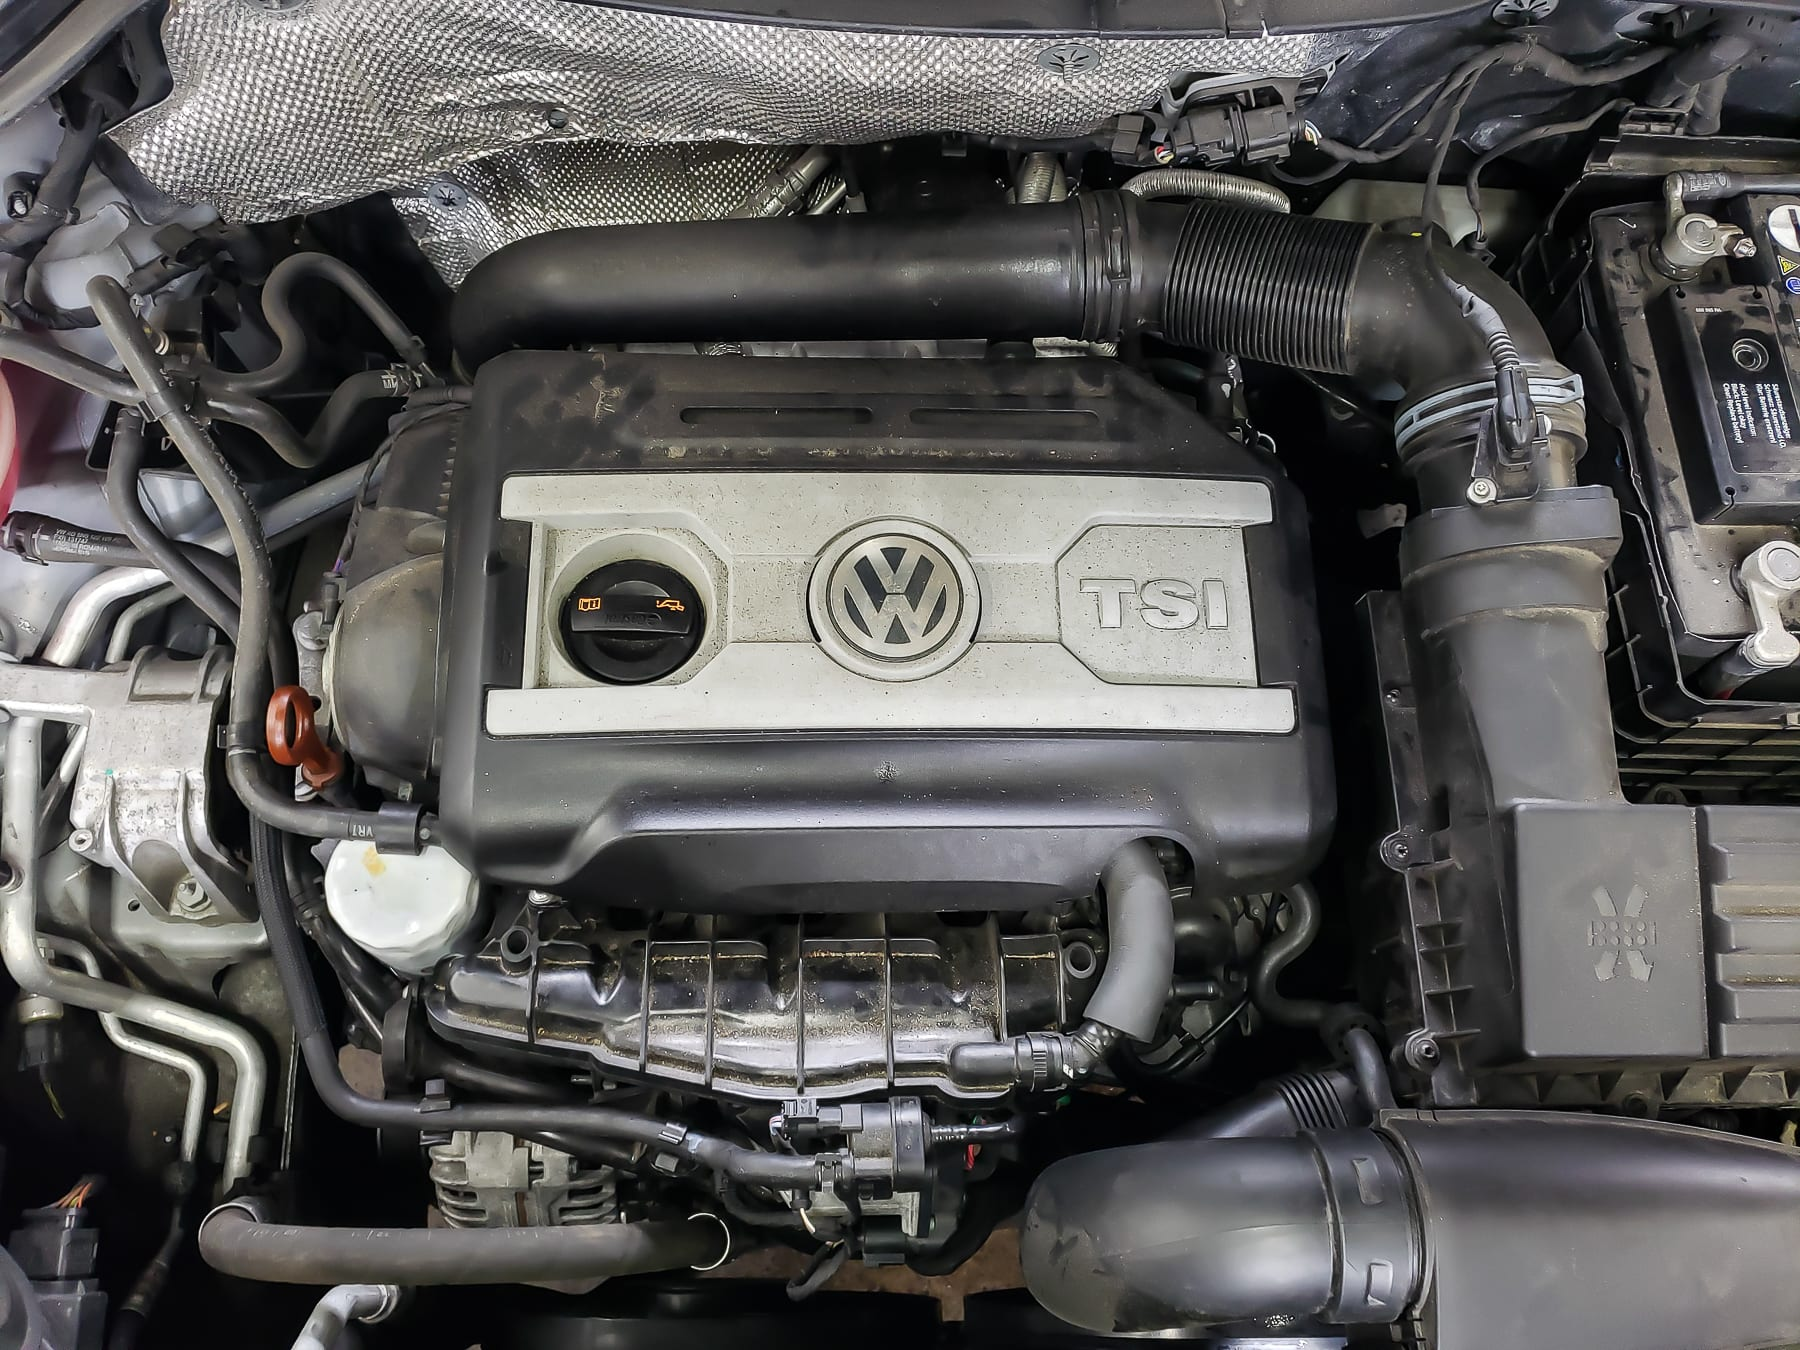 2012 VW Tiguan-Water Pump Replacement